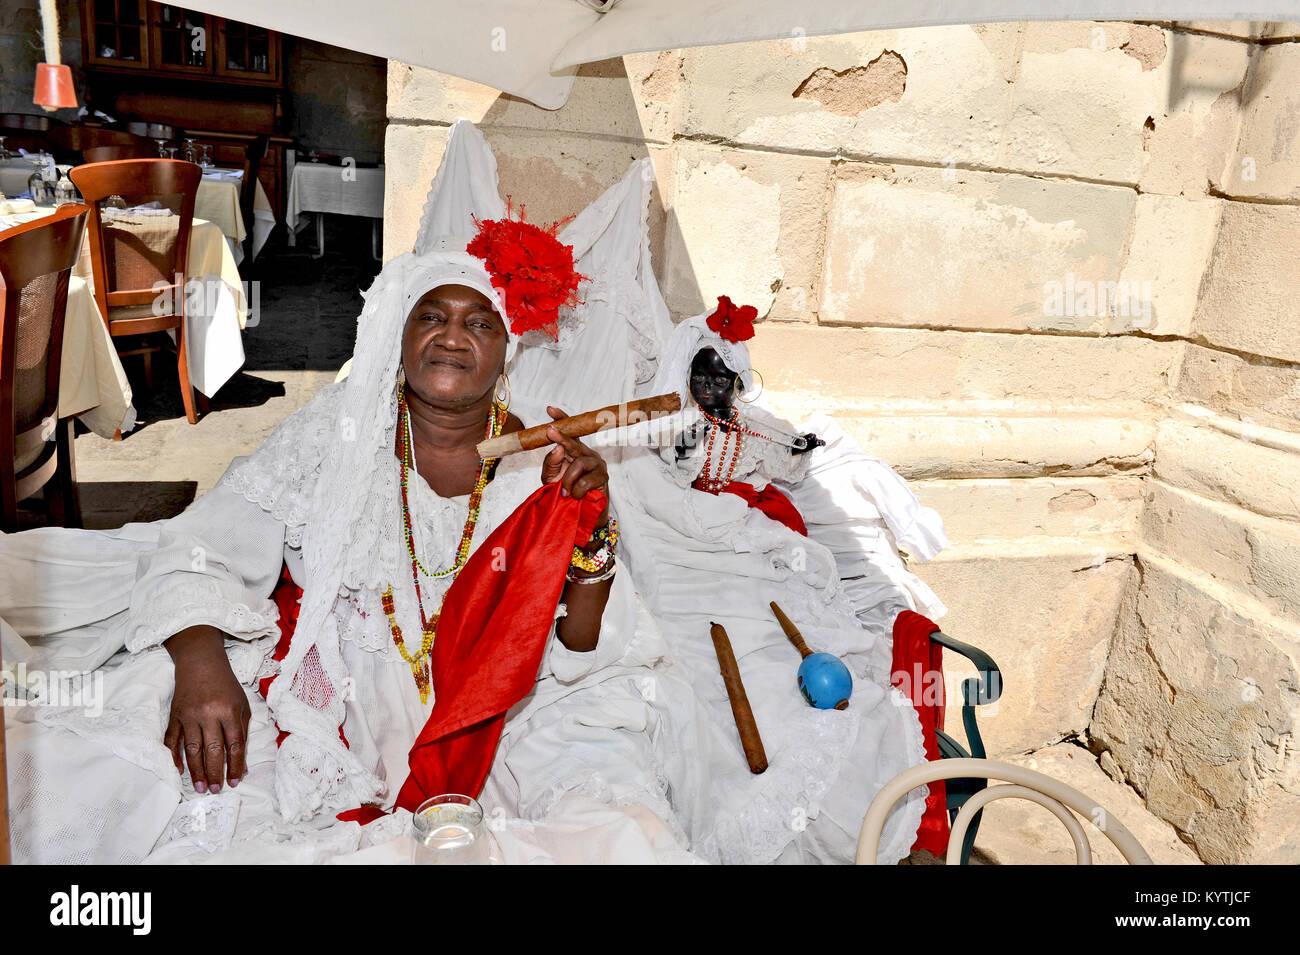 Cuban Woman Santeria Stock Photos & Cuban Woman Santeria